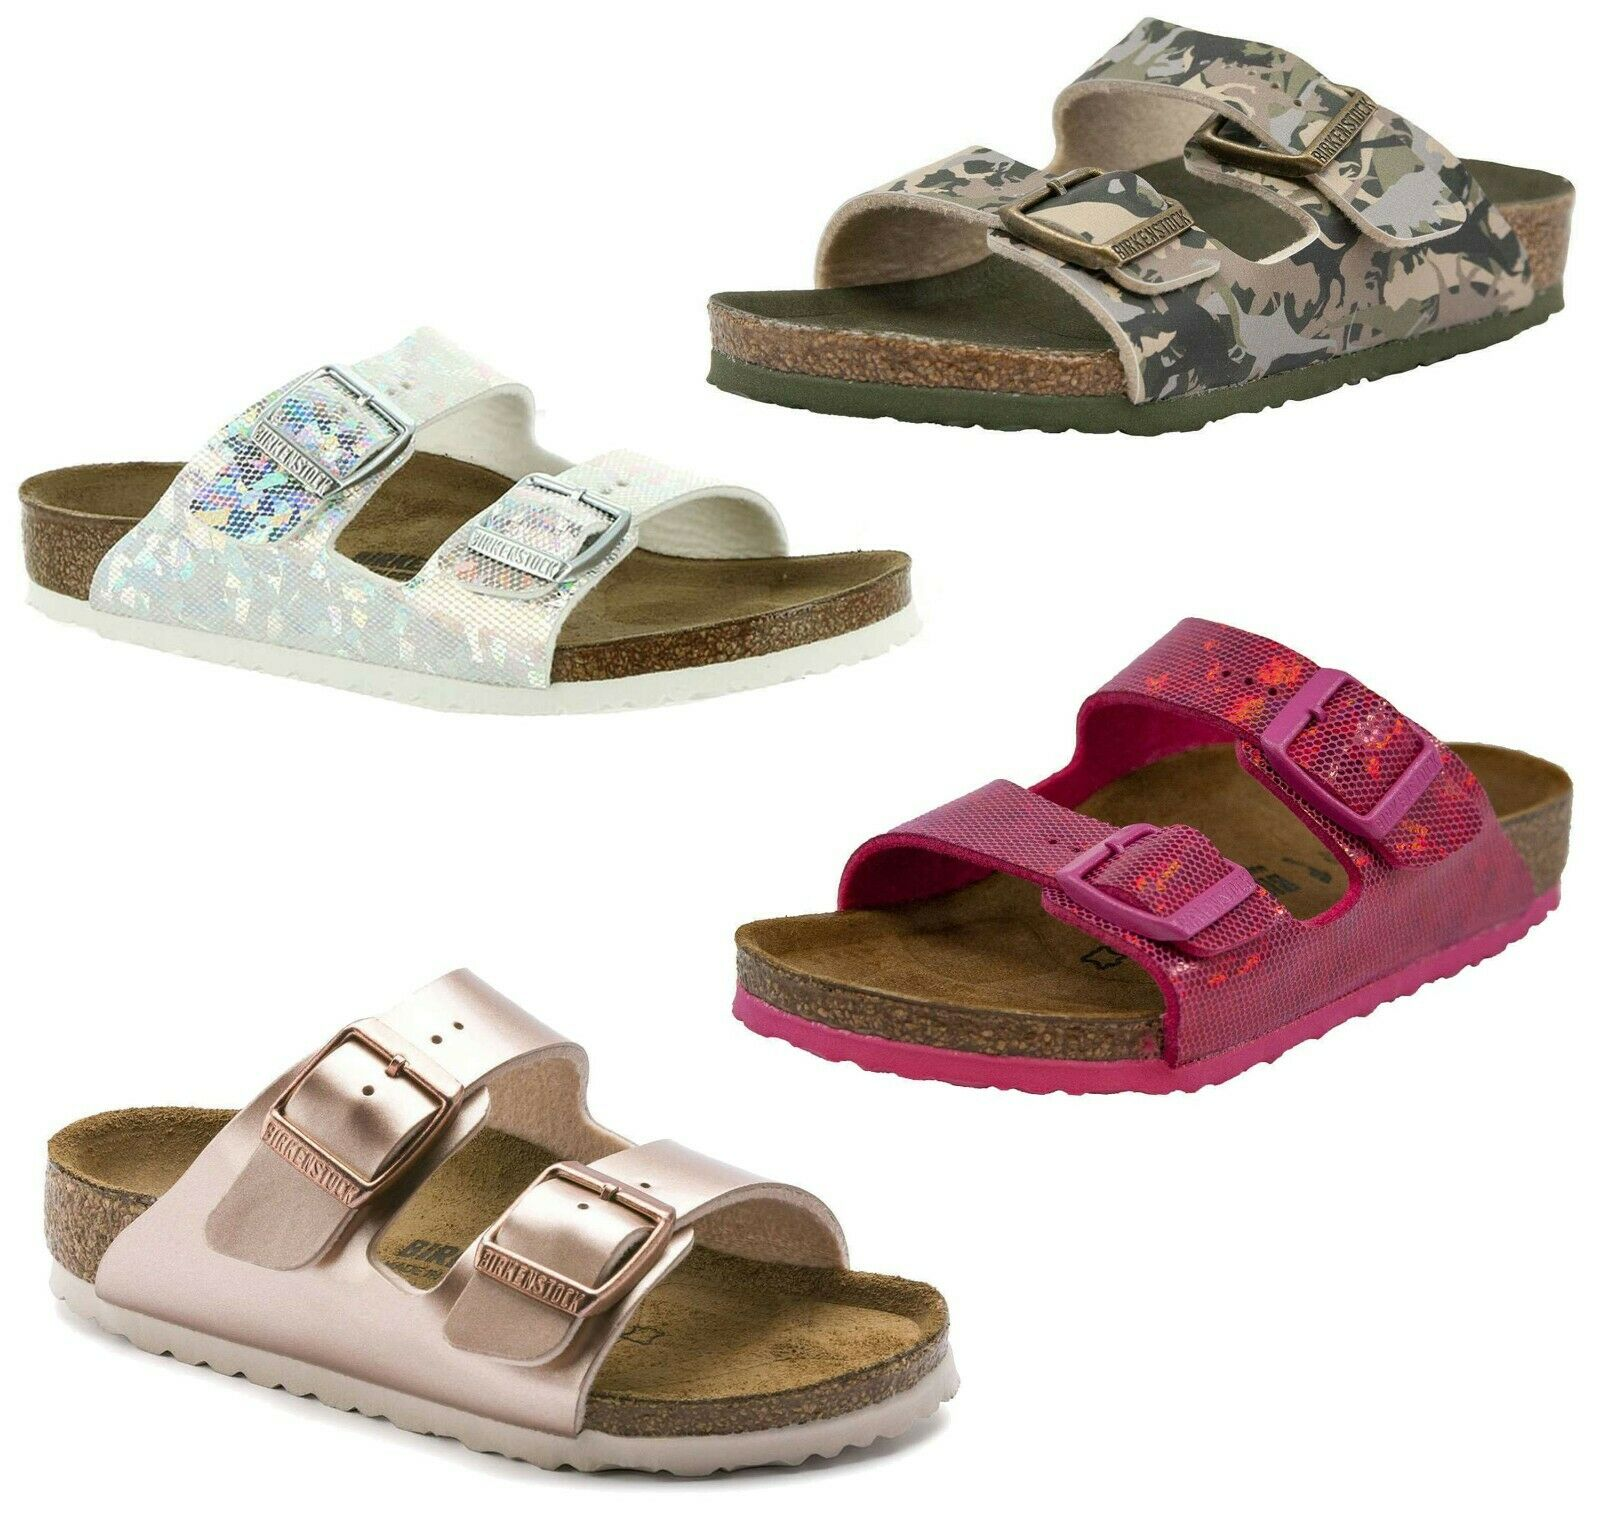 NEW Birkenstock Kids Unisex ARIZONA Girls Boys 2-Stripes Summer Sandals Slides